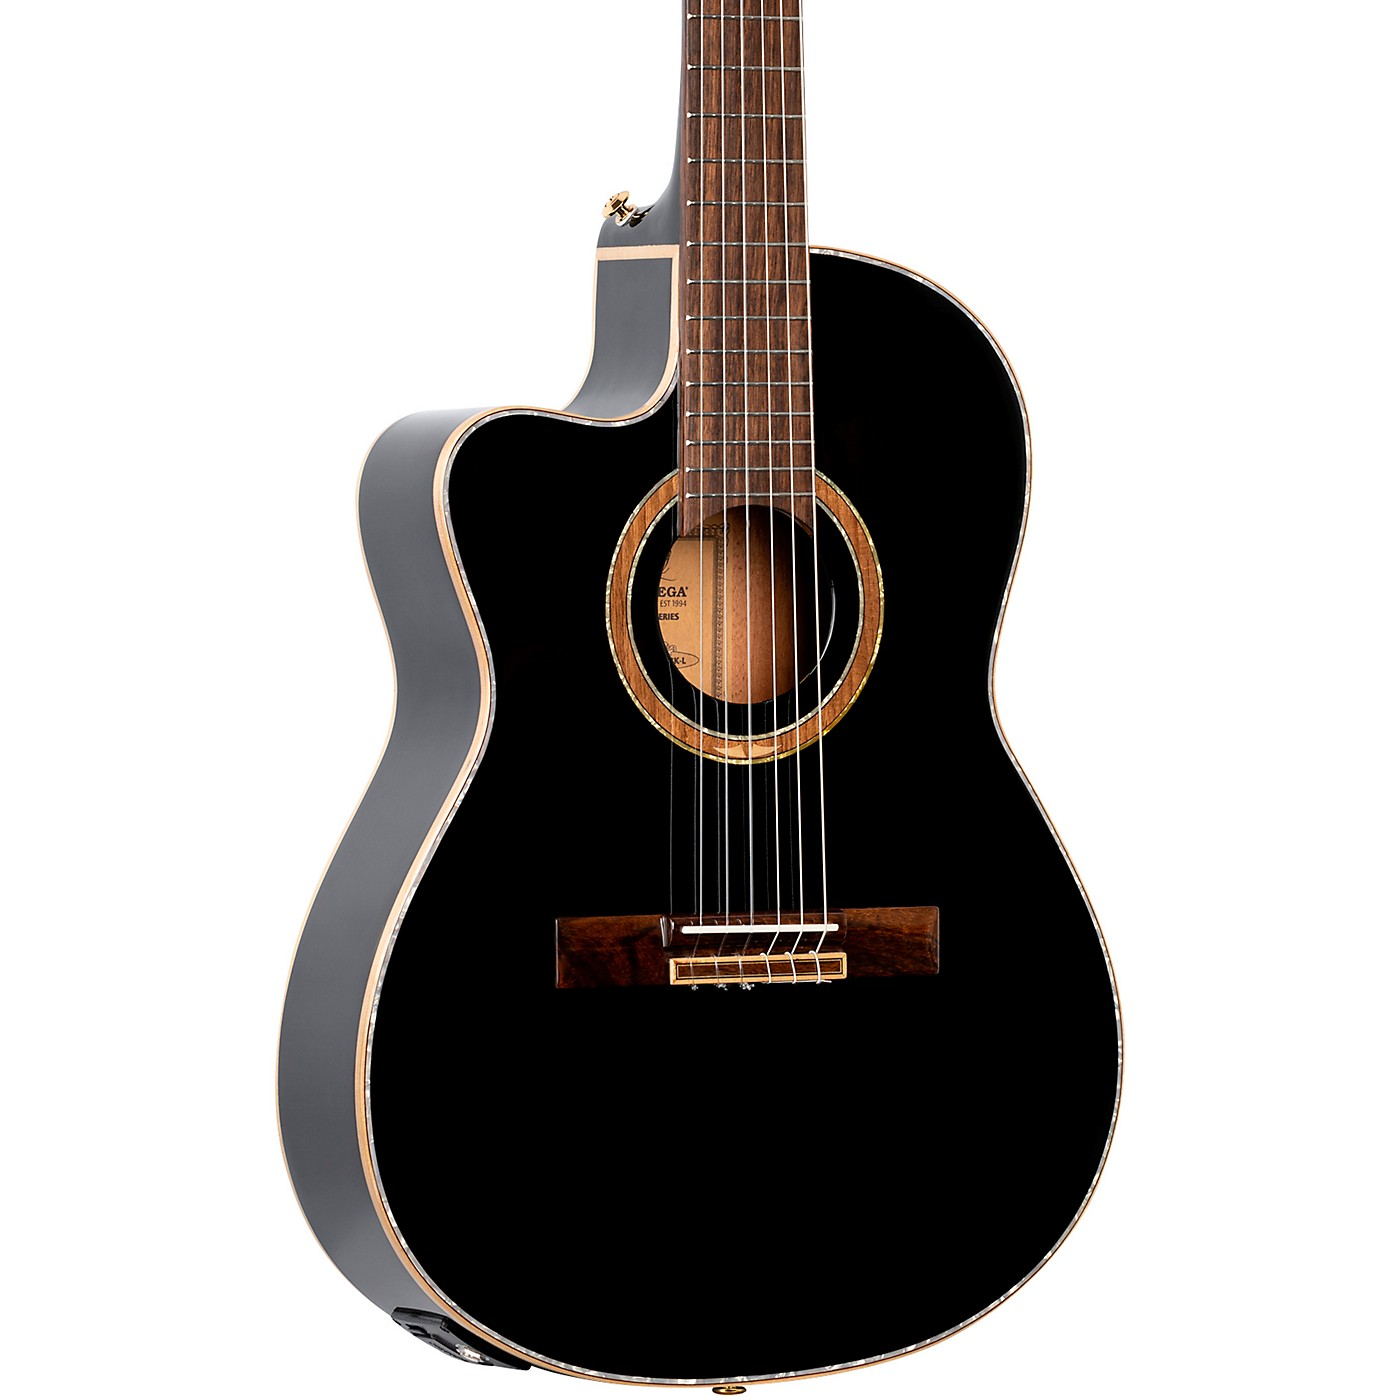 Ortega Performer Series RCE138-T4BK-L Thinline Acoustic Electric Nylon Guitar thumbnail